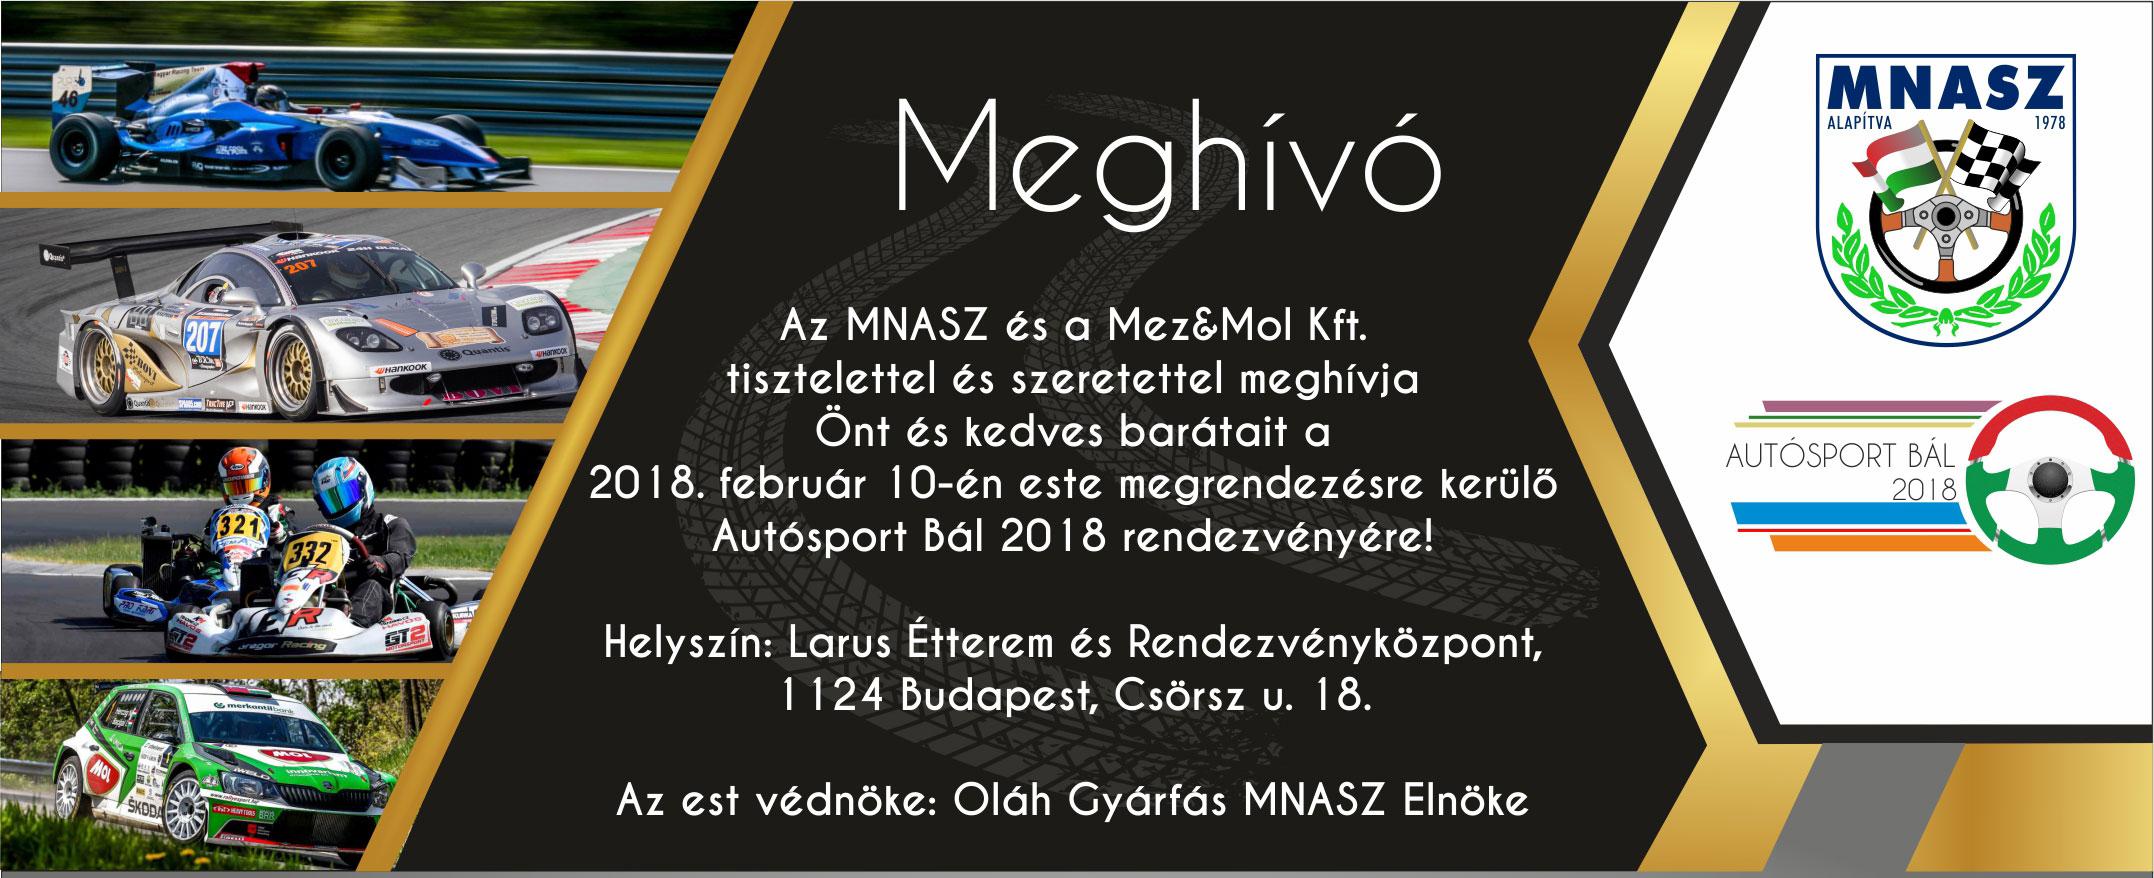 autosport_bal_meghivo_web.jpg